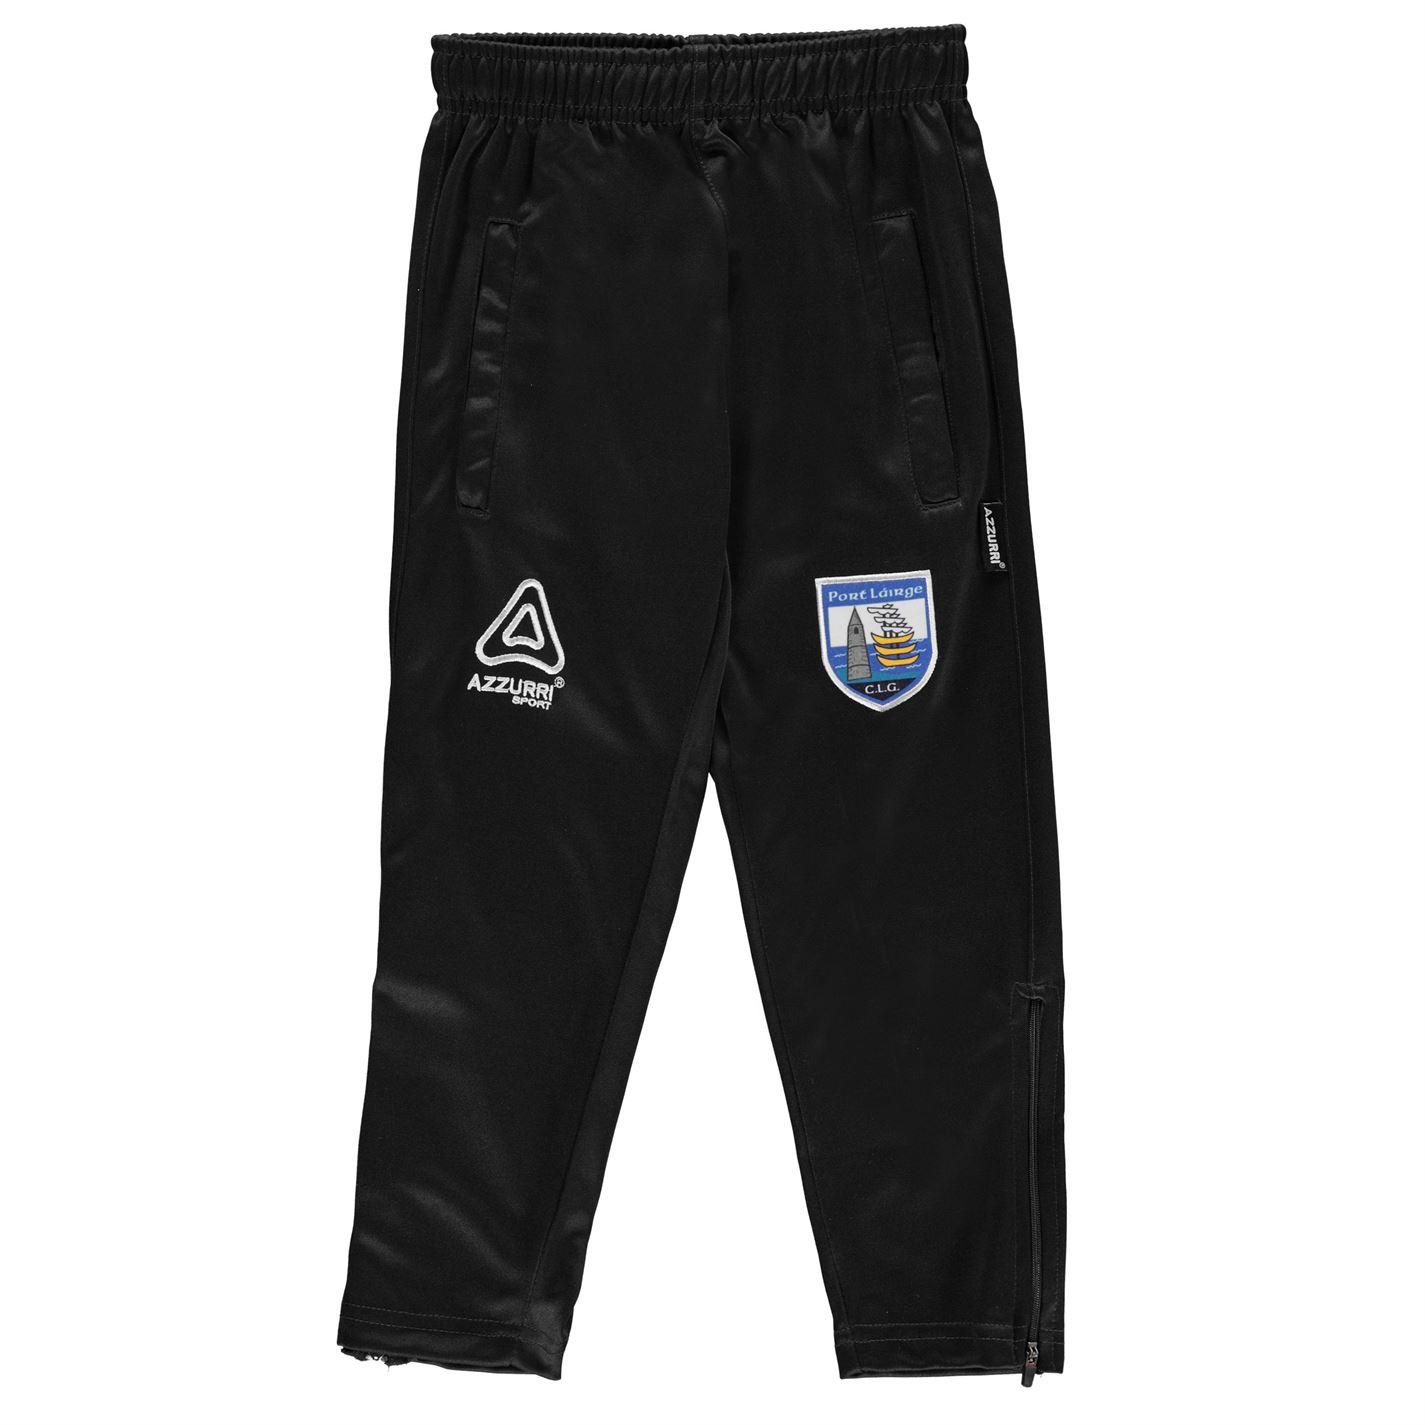 Azzurri Kinvara Jogging Pants Junior Boys